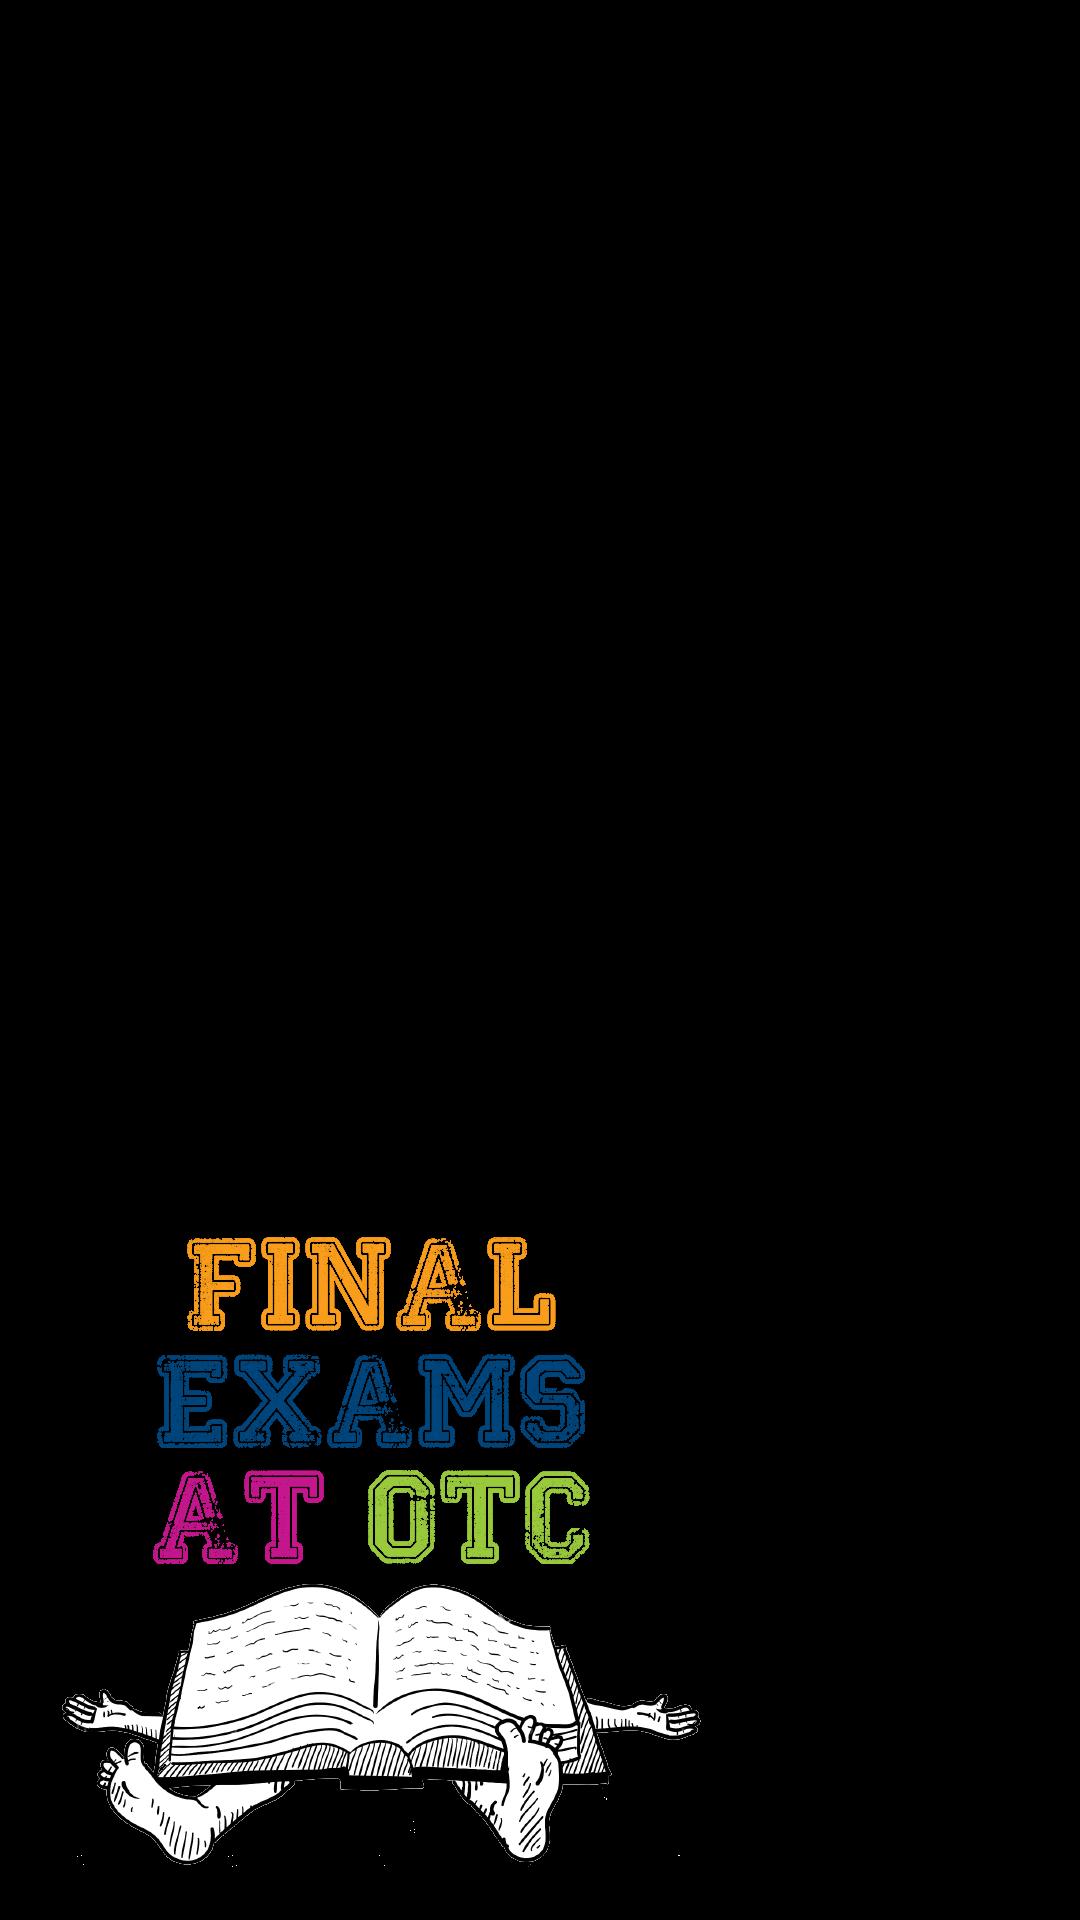 Final Exams at OTC Challenge